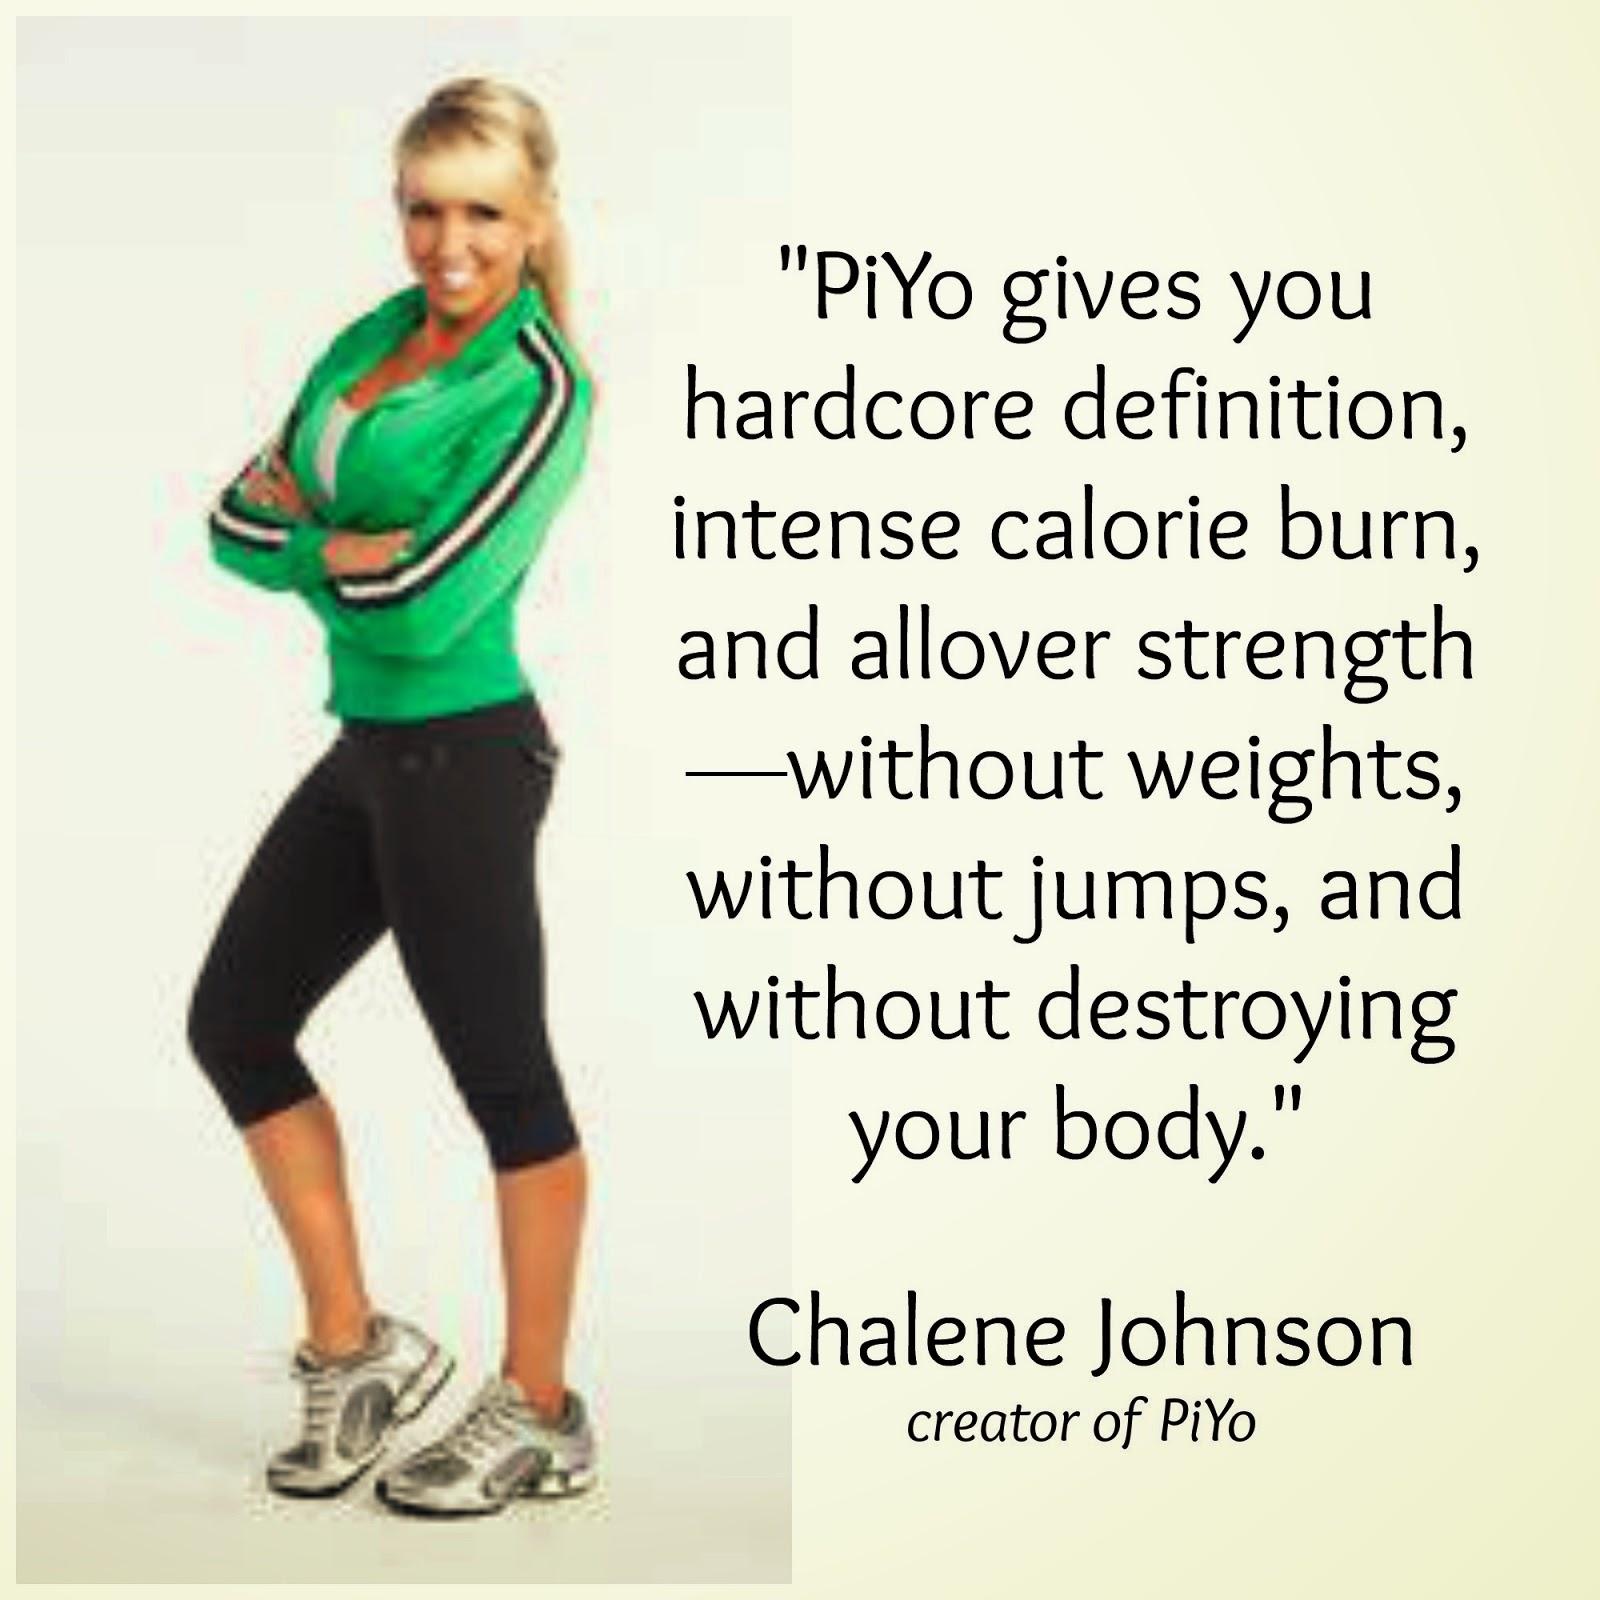 www.alysonhorcher.com, PiYo, PiYo Strength, Piyo Instructor, Piyo certified, what is Piyo